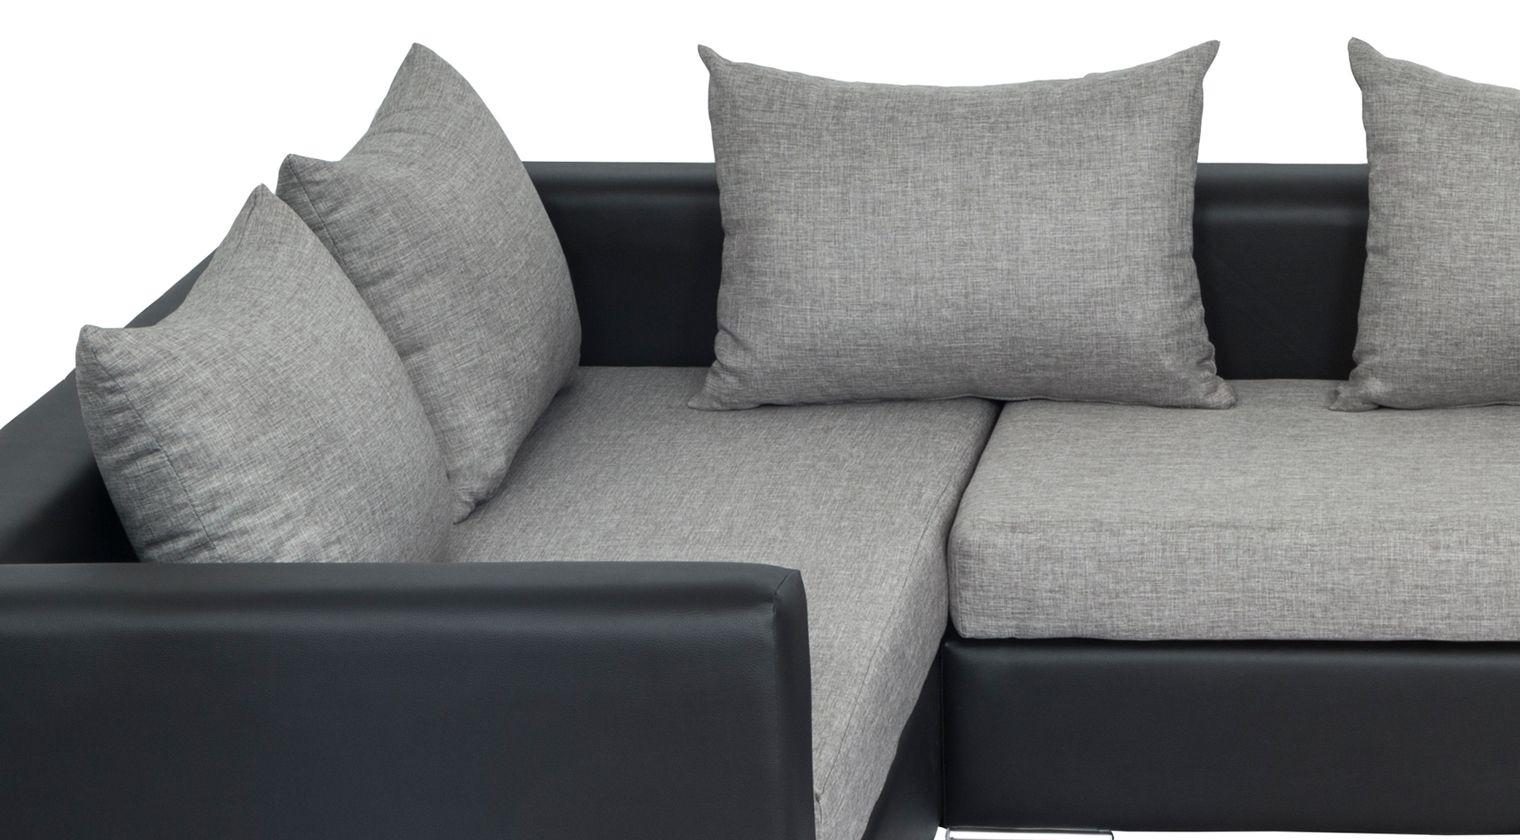 Sof rinconera sevilla sofas rinconera for Sofas sevilla